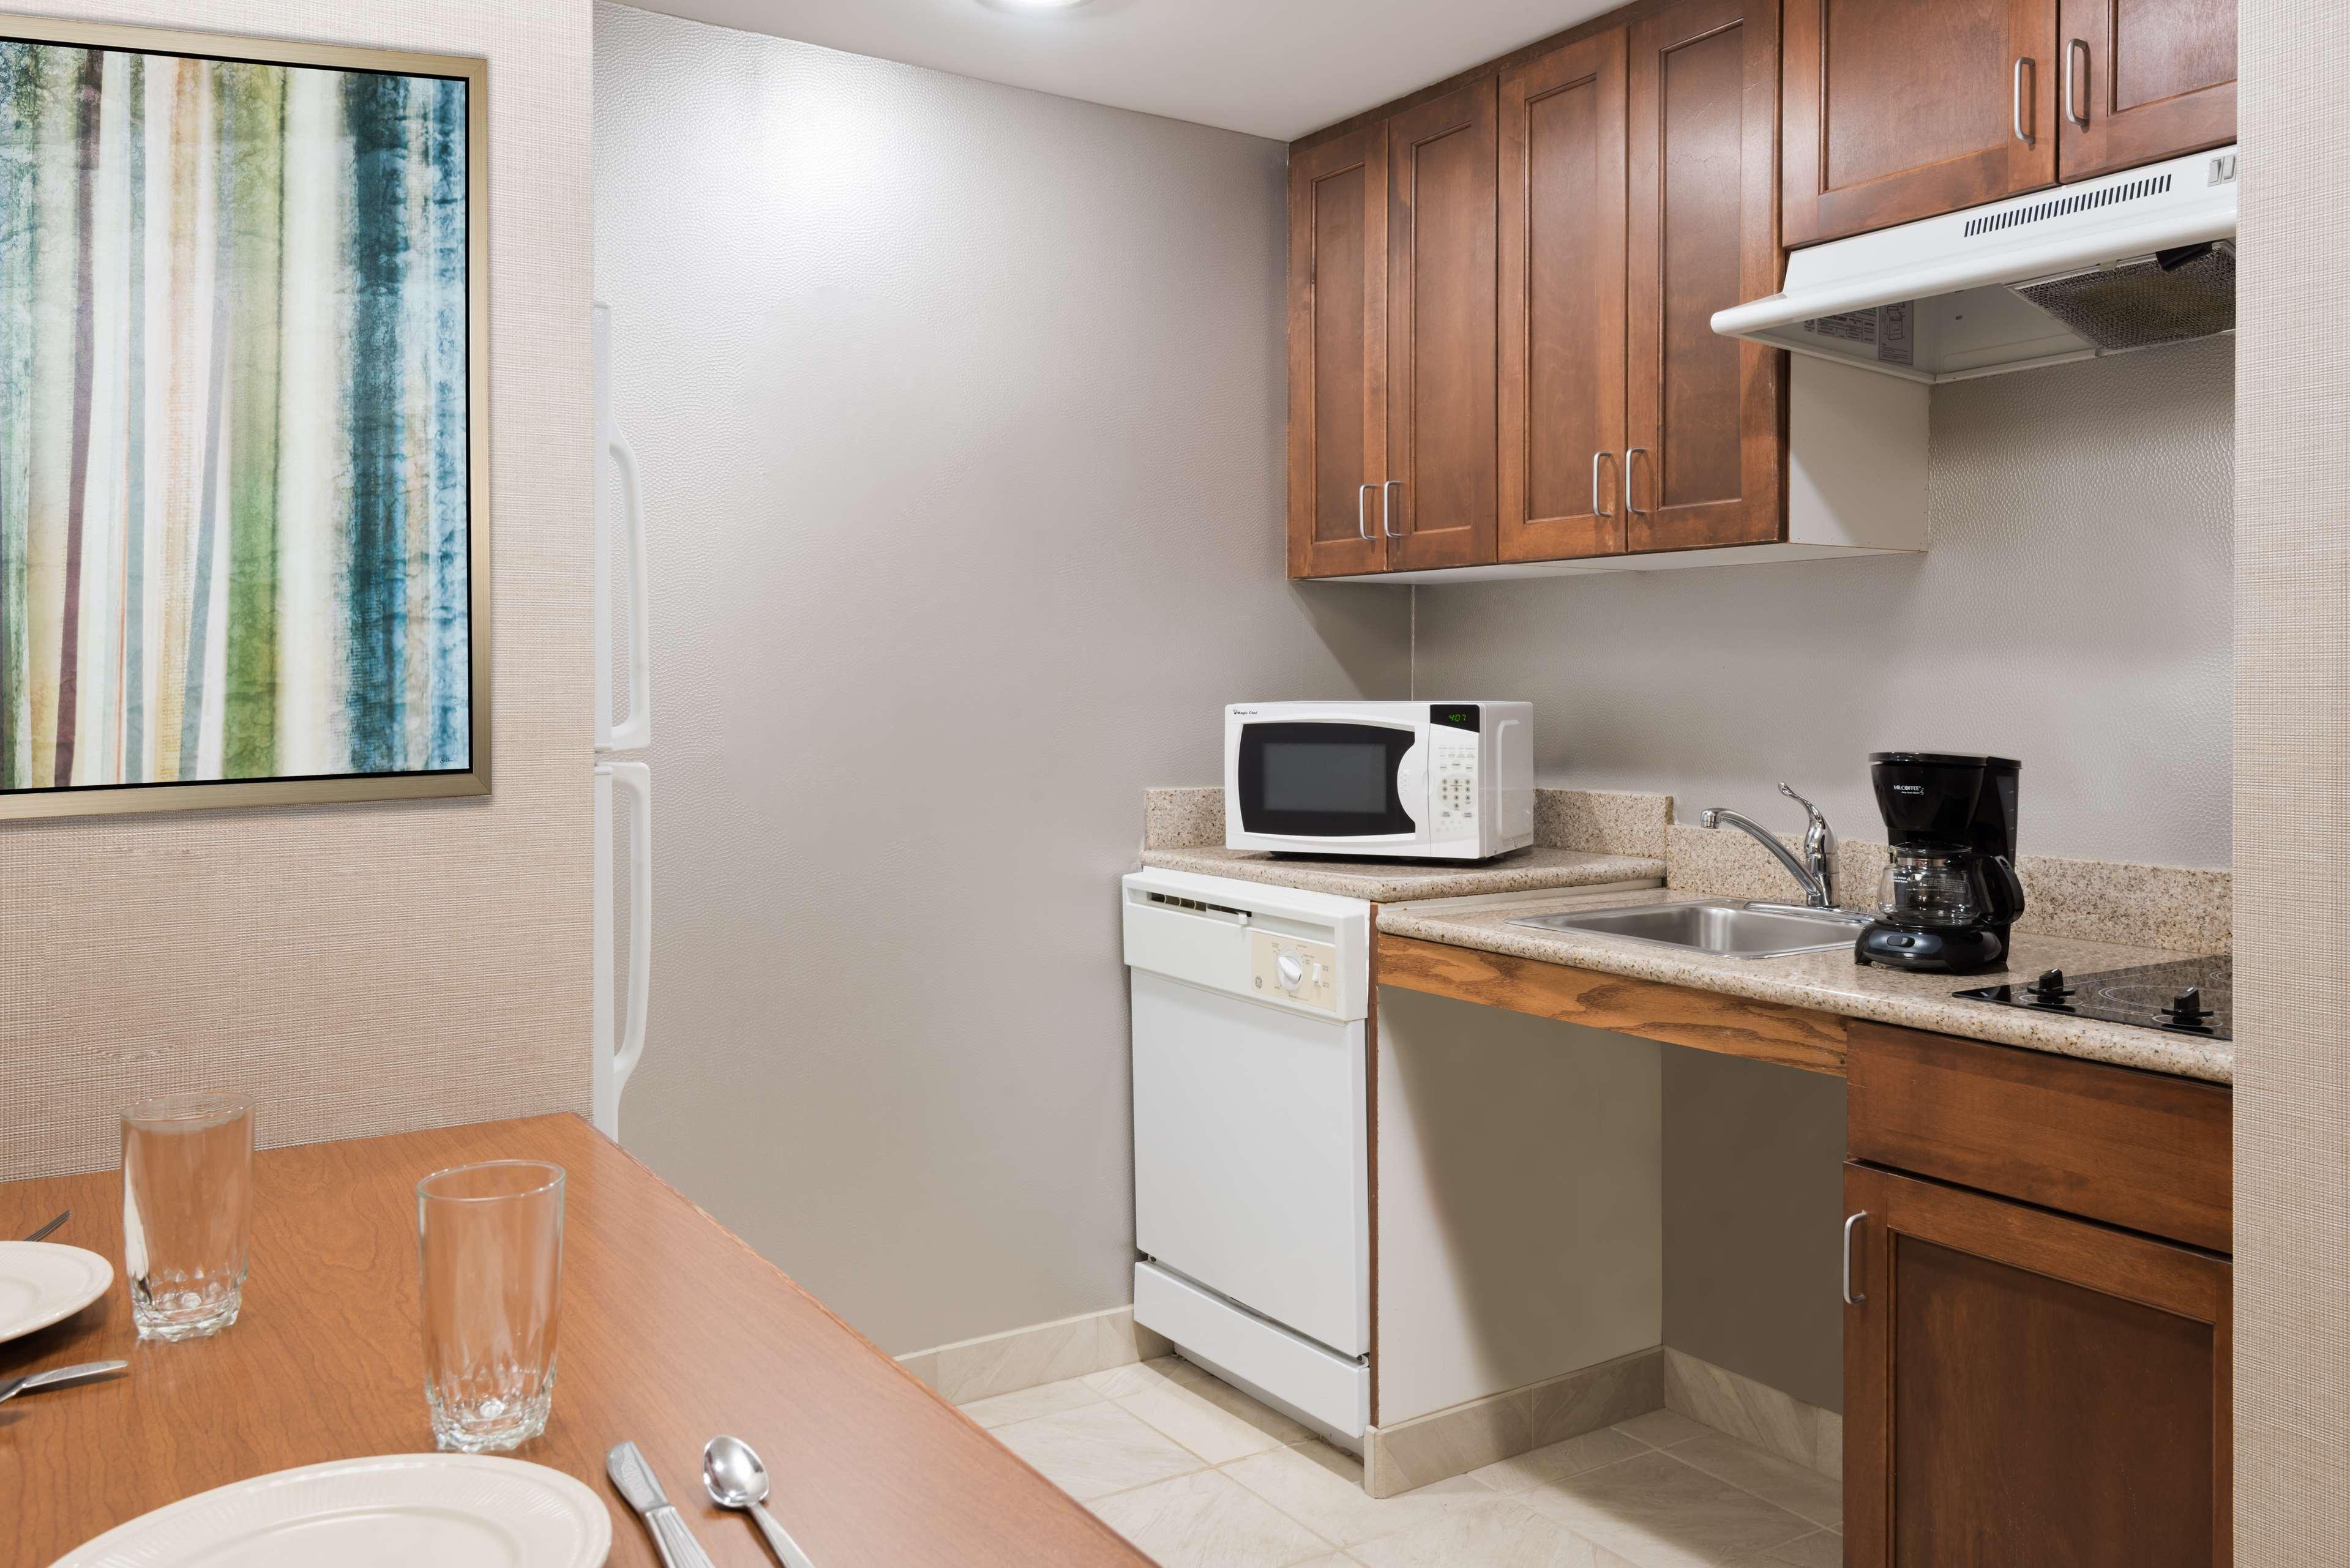 Homewood Suites by Hilton Holyoke-Springfield/North image 17